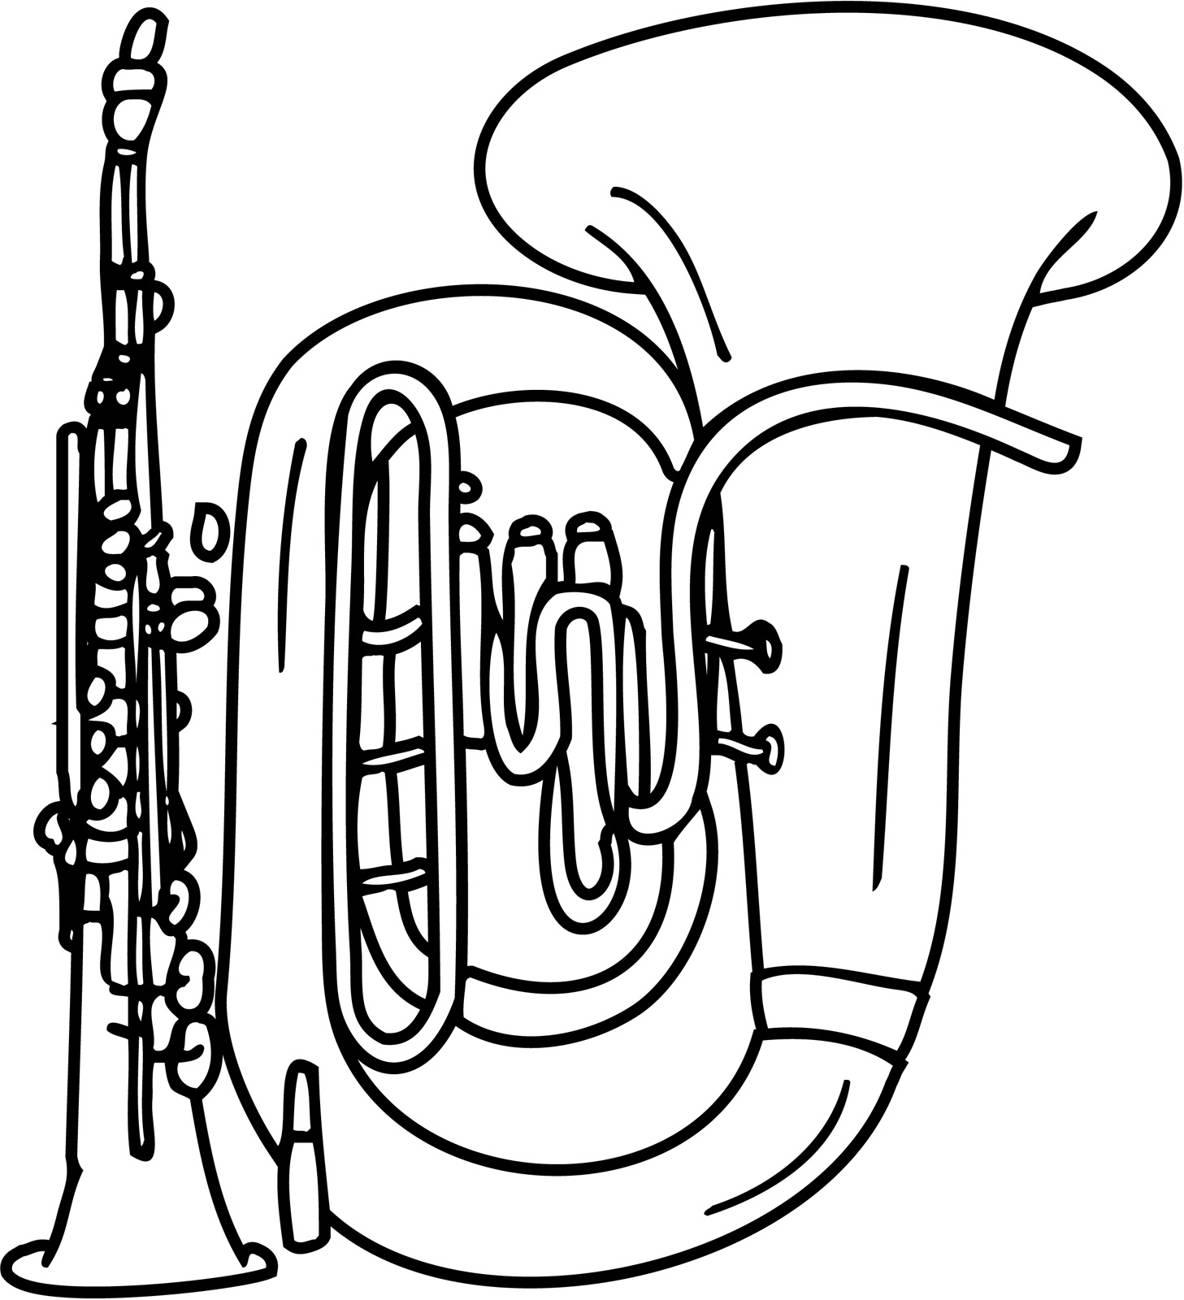 MUSIC-099